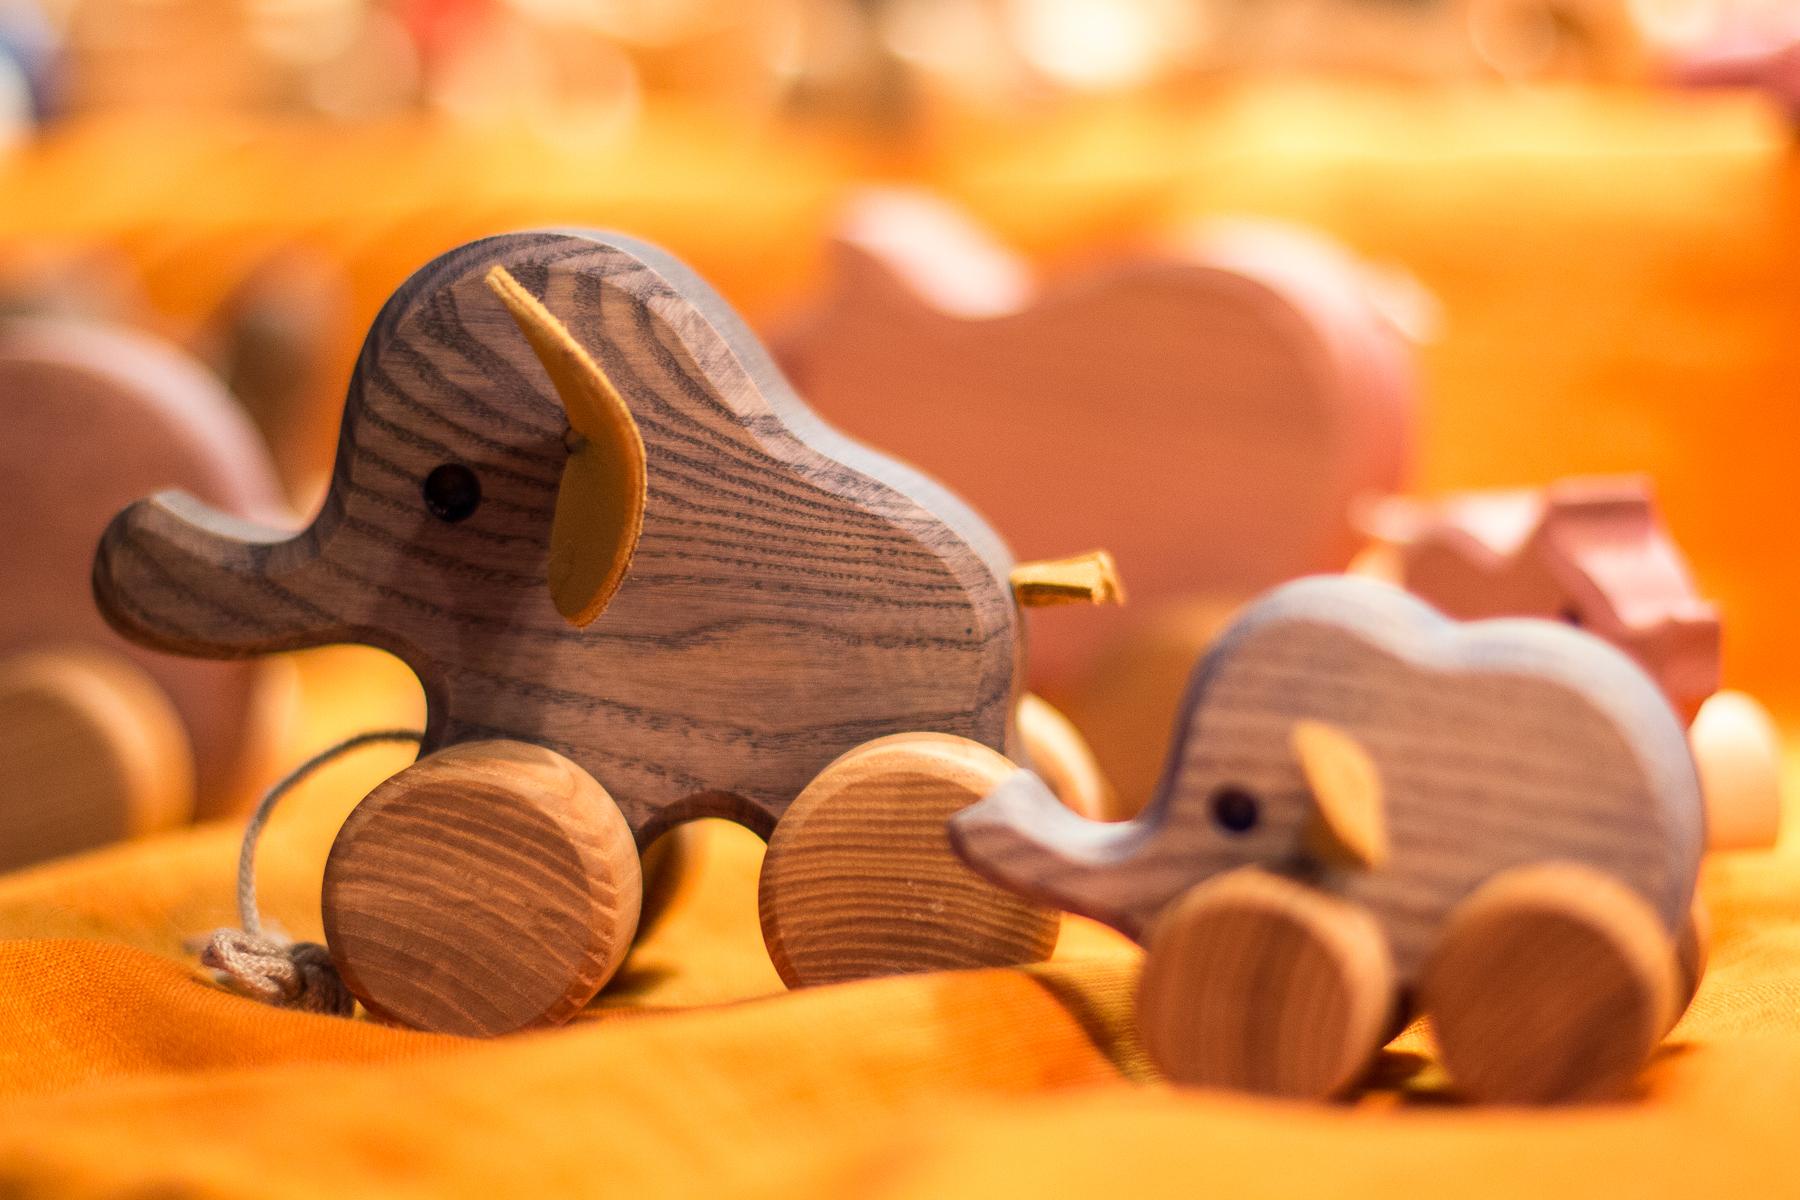 Wooden Elephants Via @Atisgailis